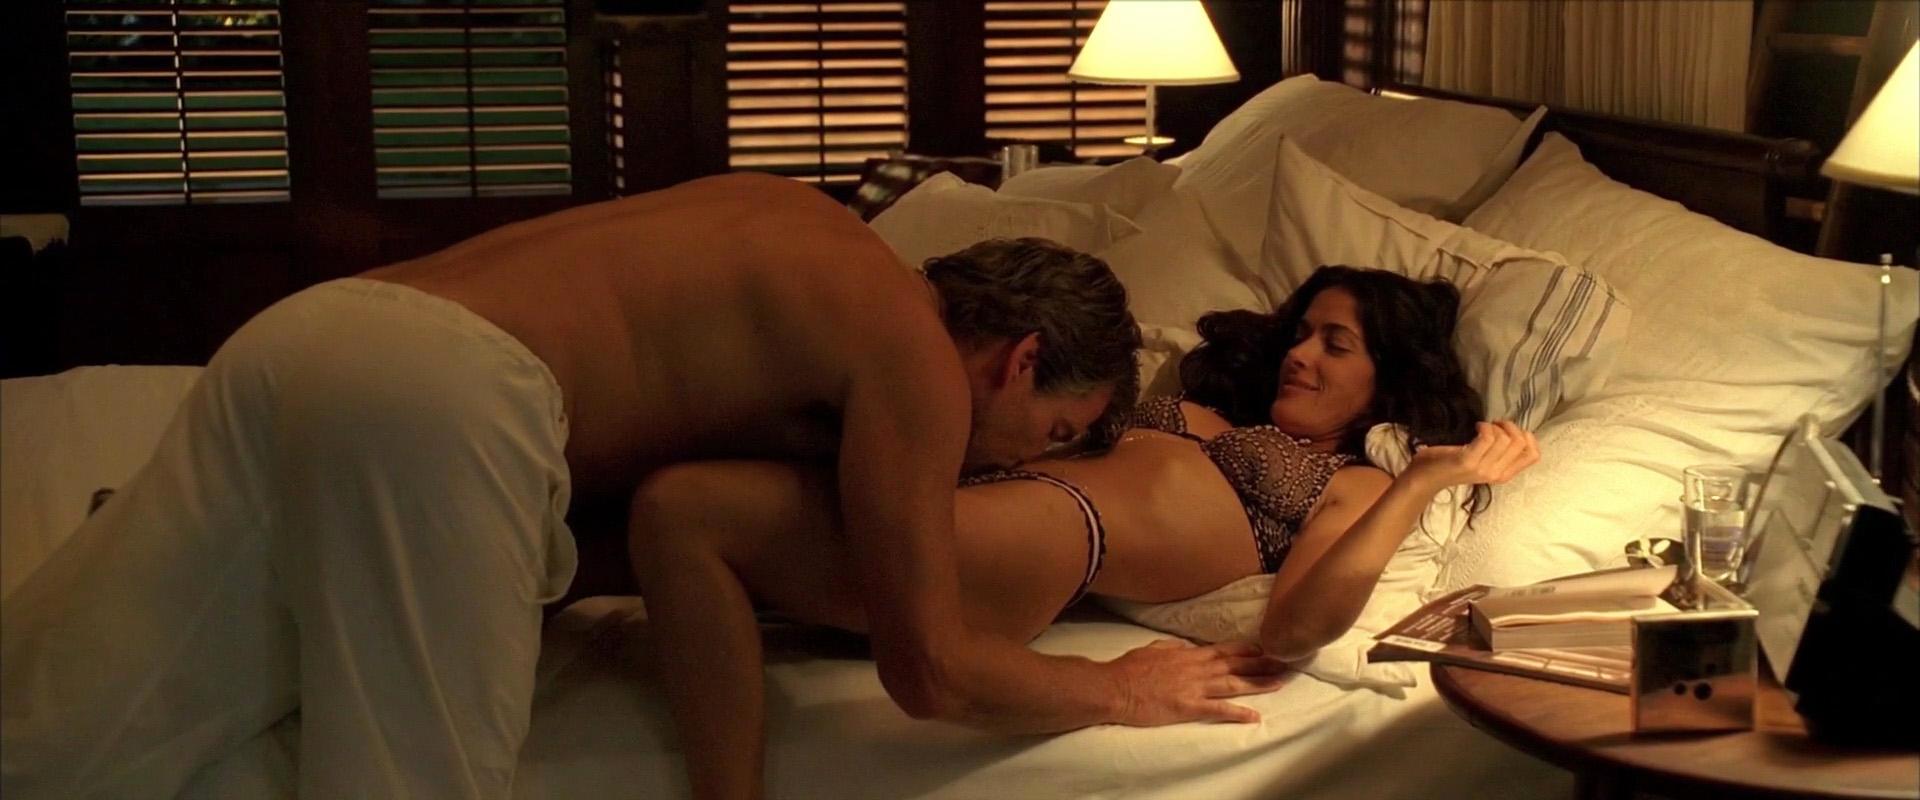 salma hayek sex scene video